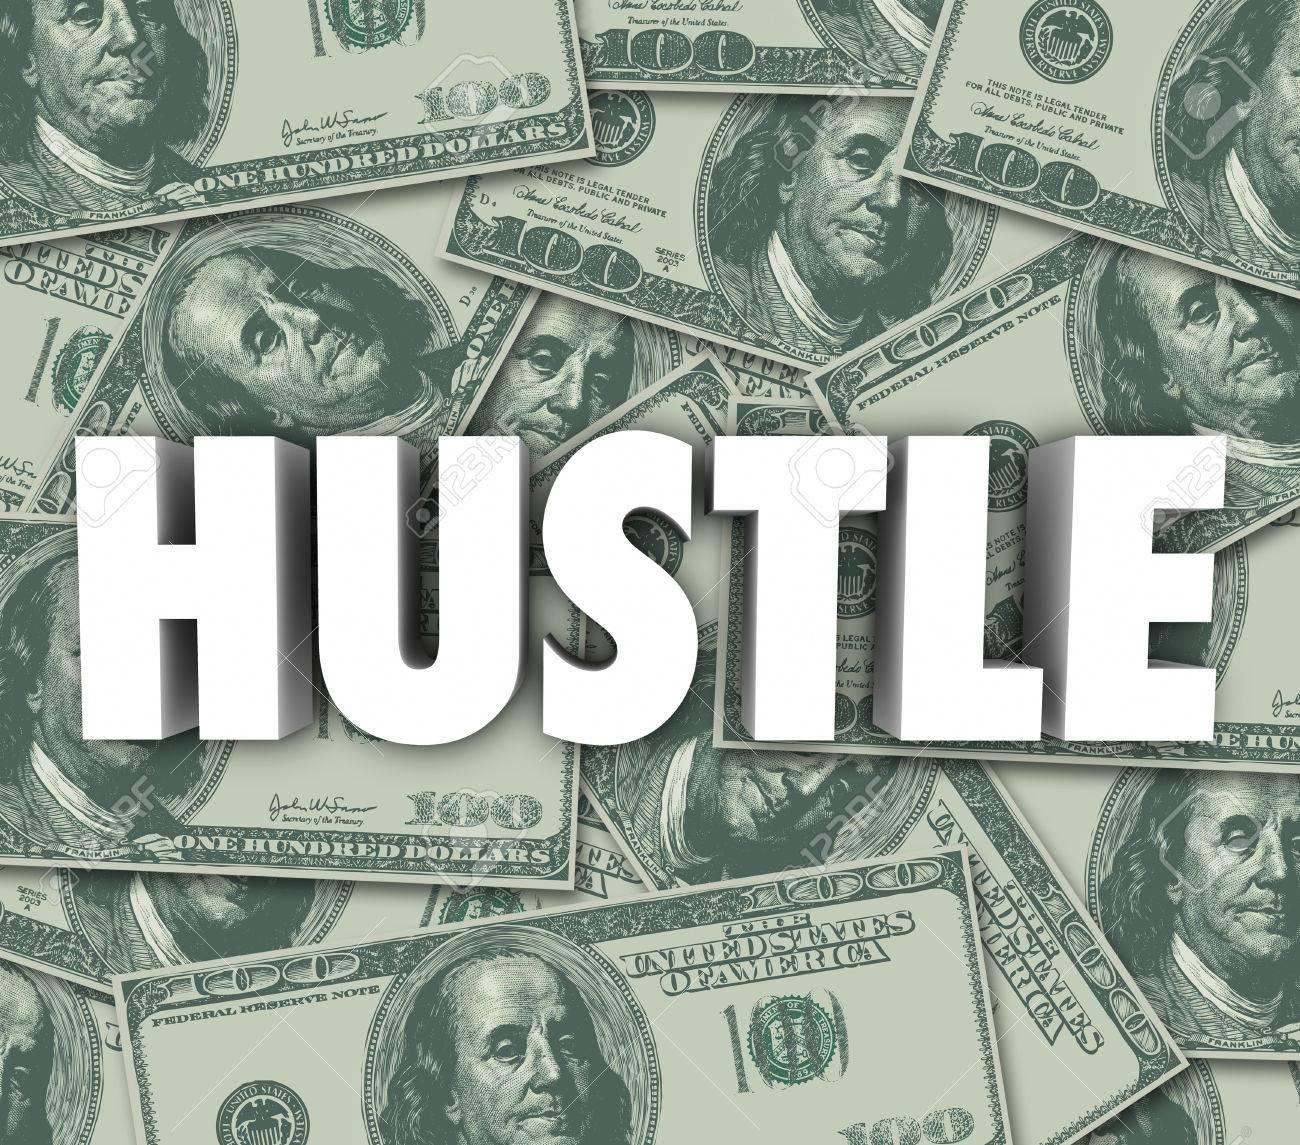 best of Hustler Letters editor